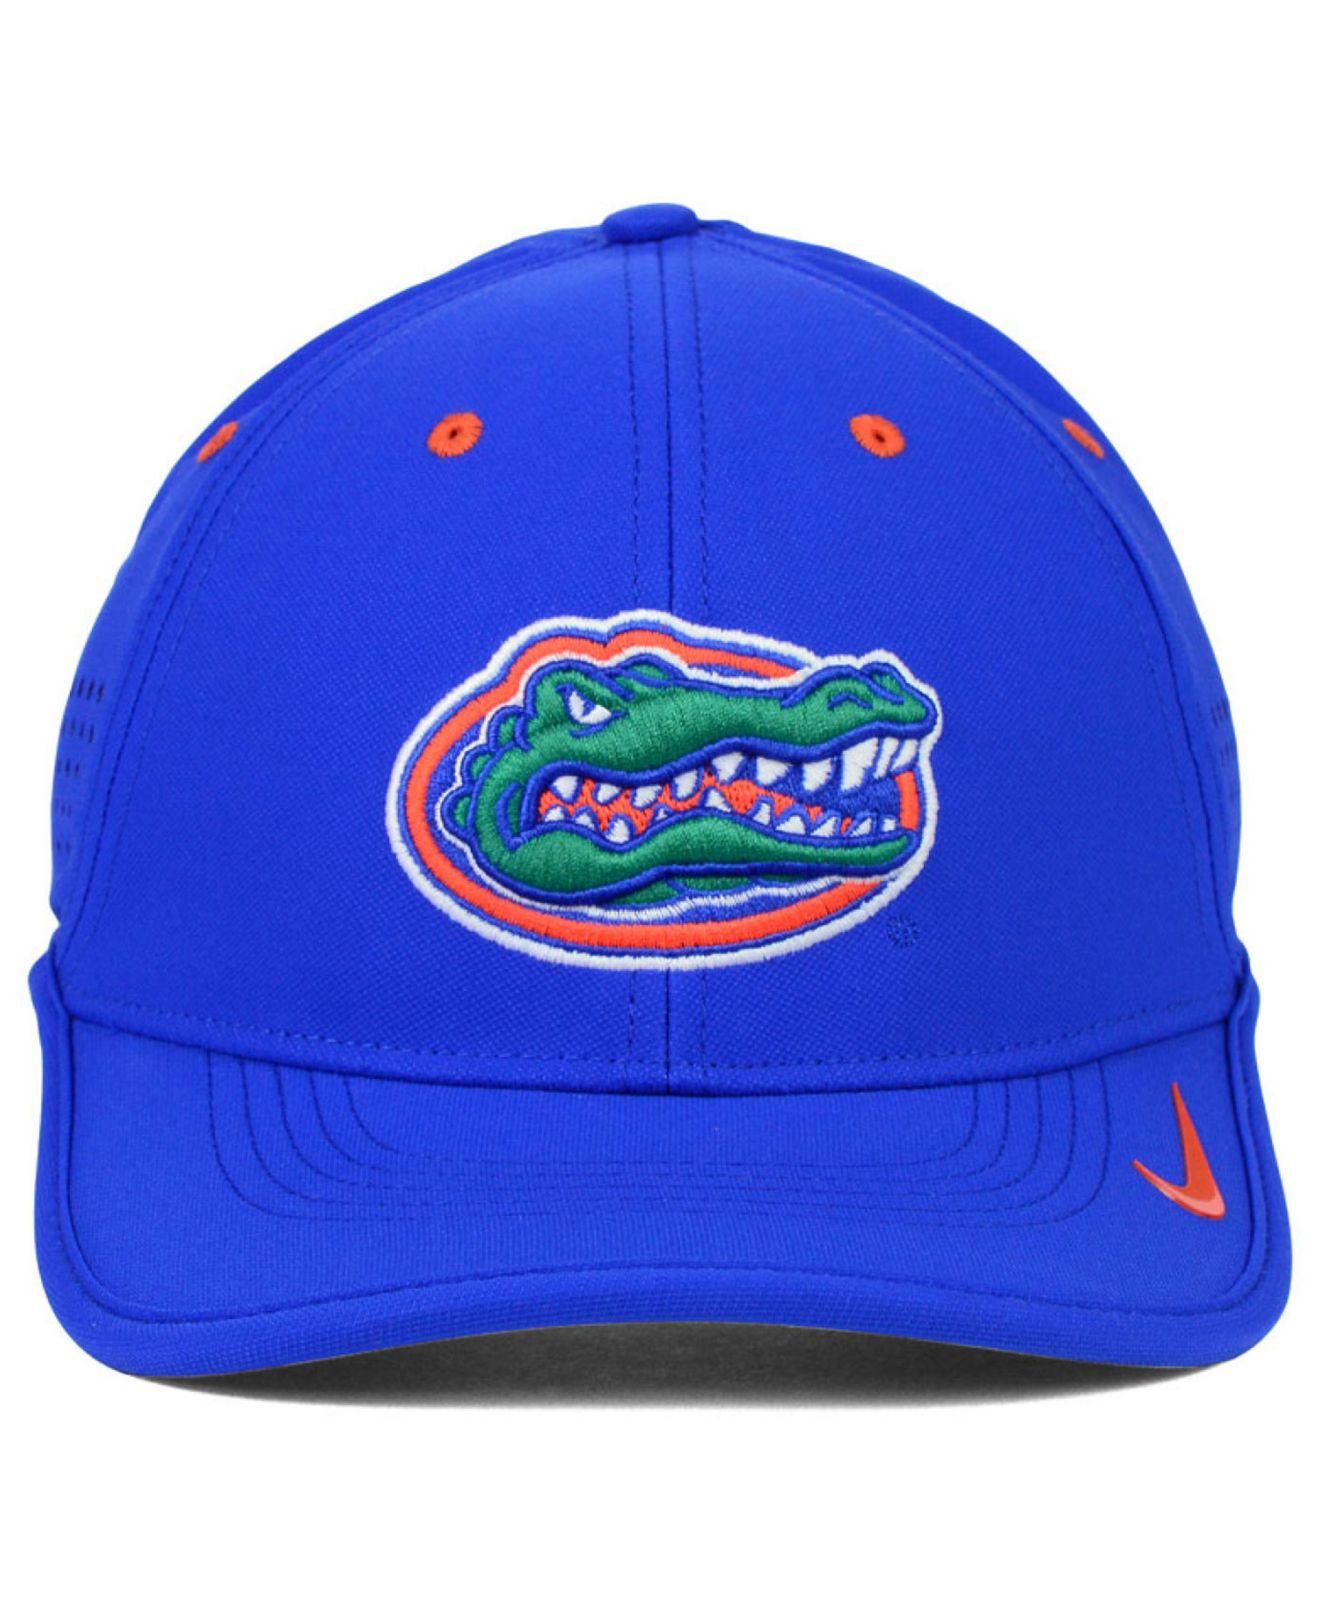 reputable site 602d8 96a53 ... inexpensive lyst nike florida gators dri fit coaches cap in blue for  men 889bb bea94